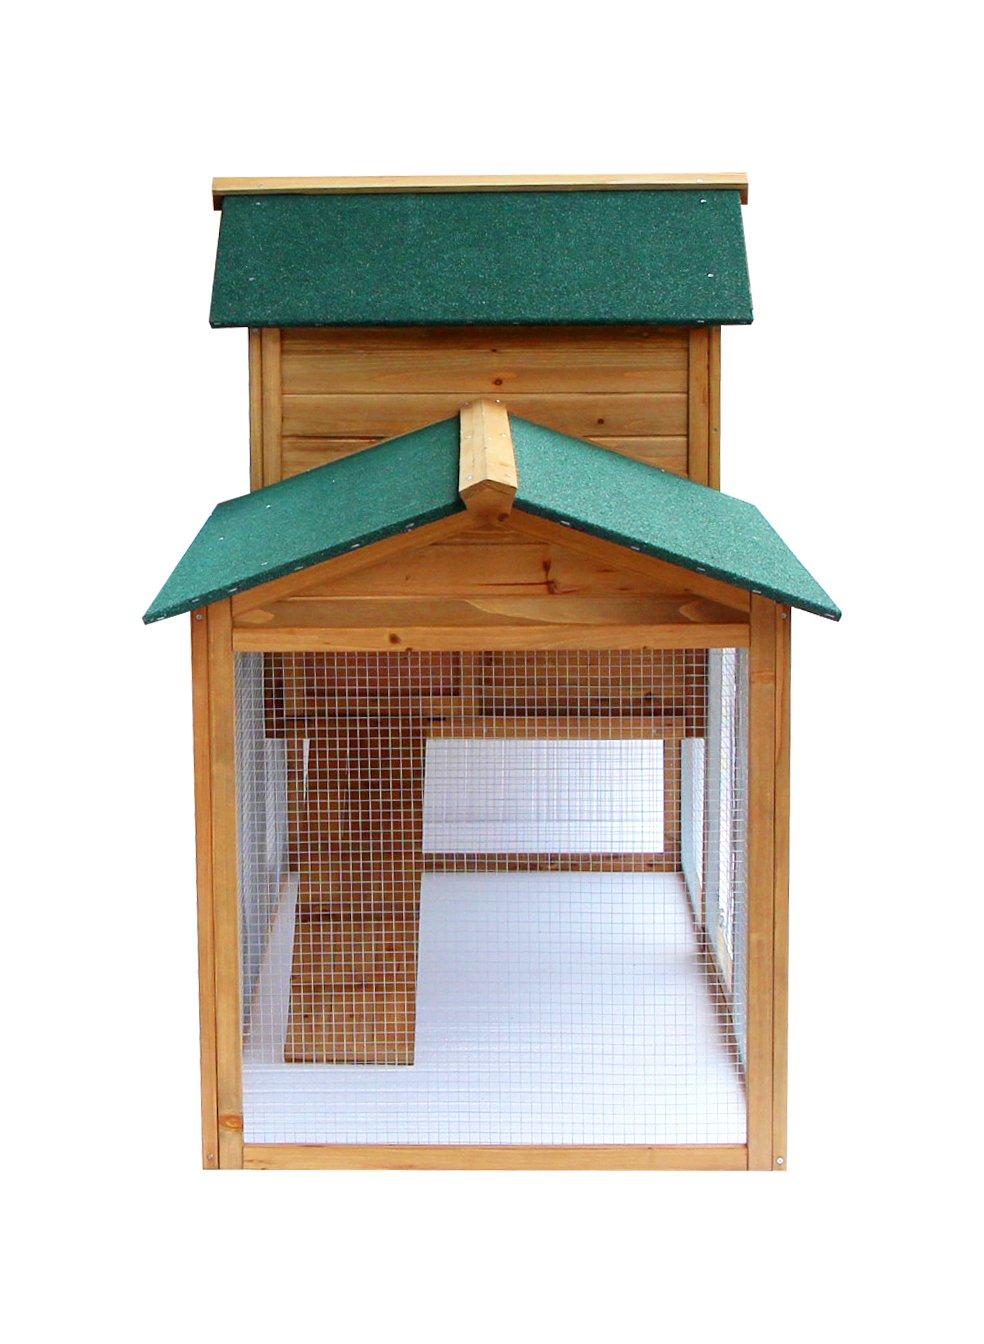 Lovupet 2135 - Gallinero, jaula, aviario de madera, para animales ...